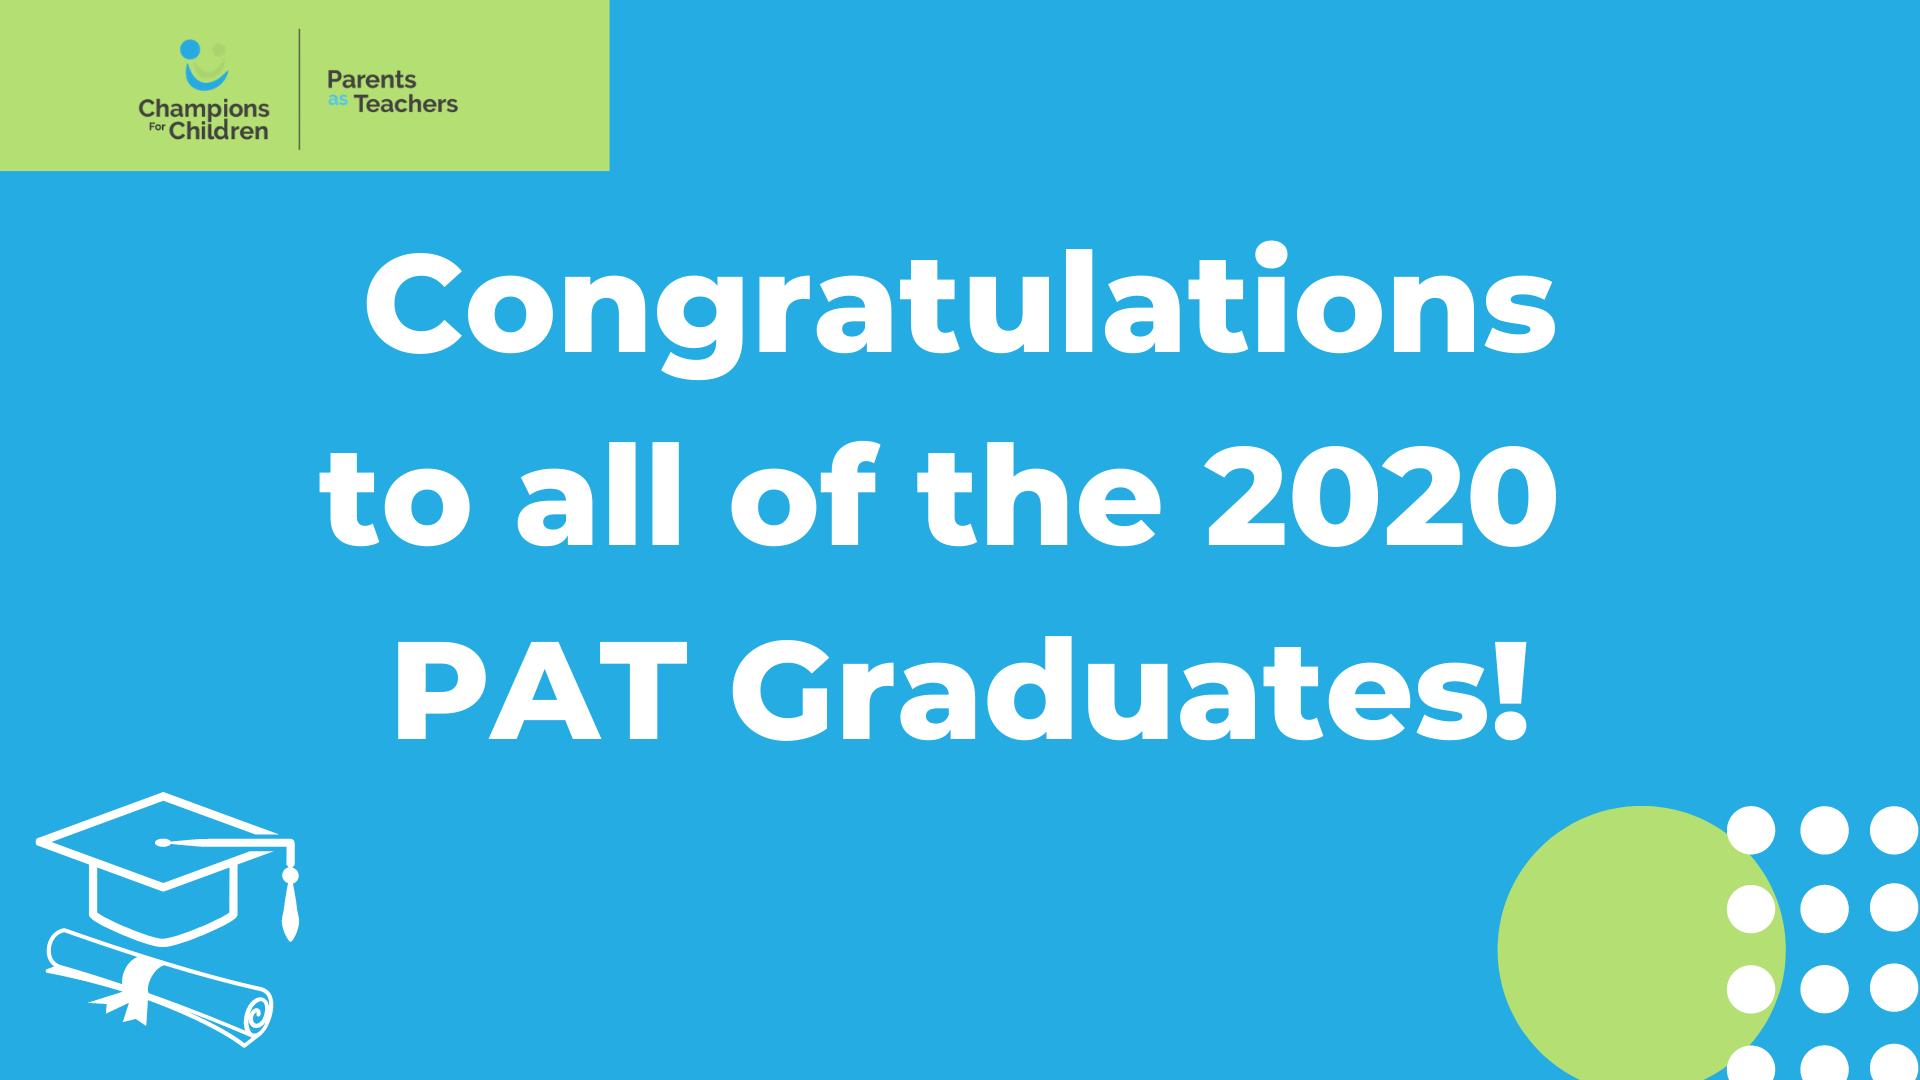 Congraulations PAT graduates